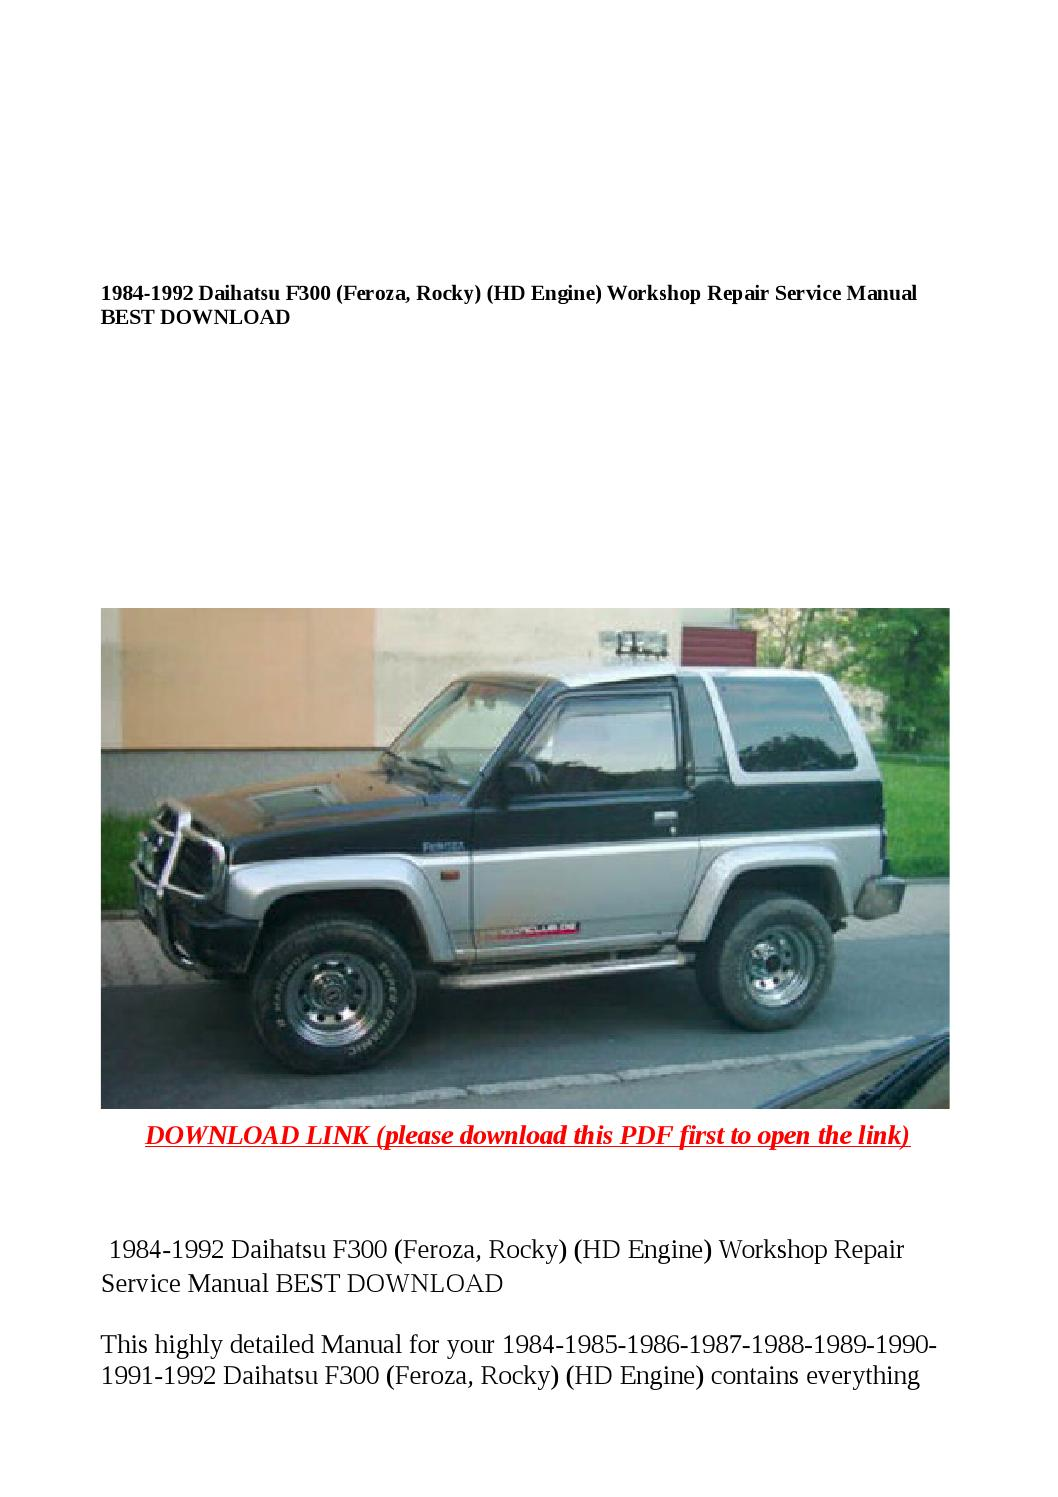 1984 1992 daihatsu f300 (feroza, rocky) (hd engine) workshop repair service  manual best download by Cindy Tinh - issuu